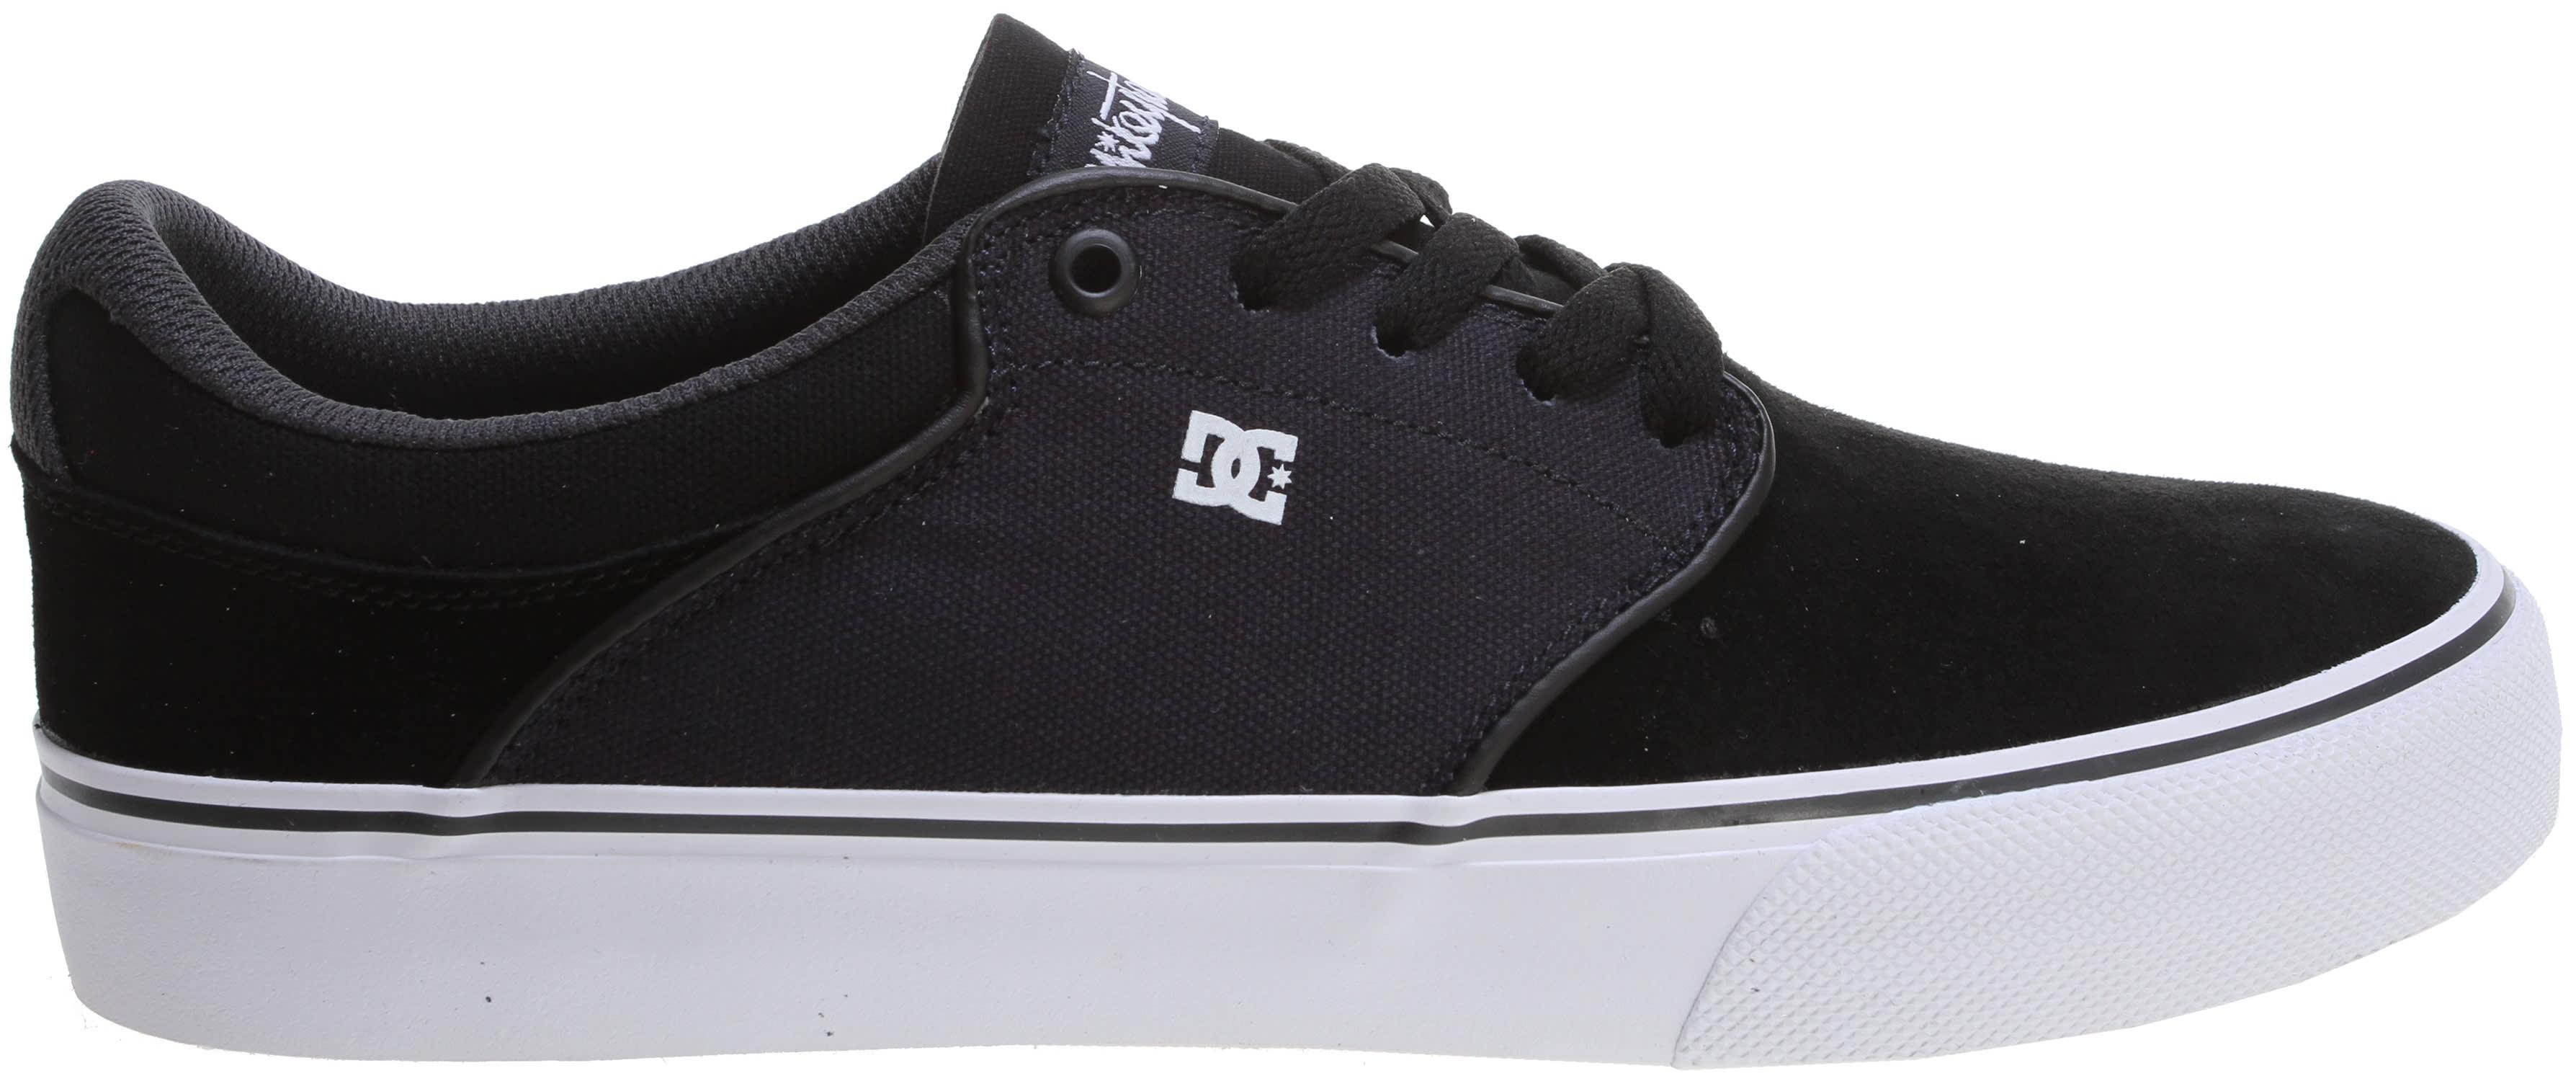 Dc Skateboard Shoes Price